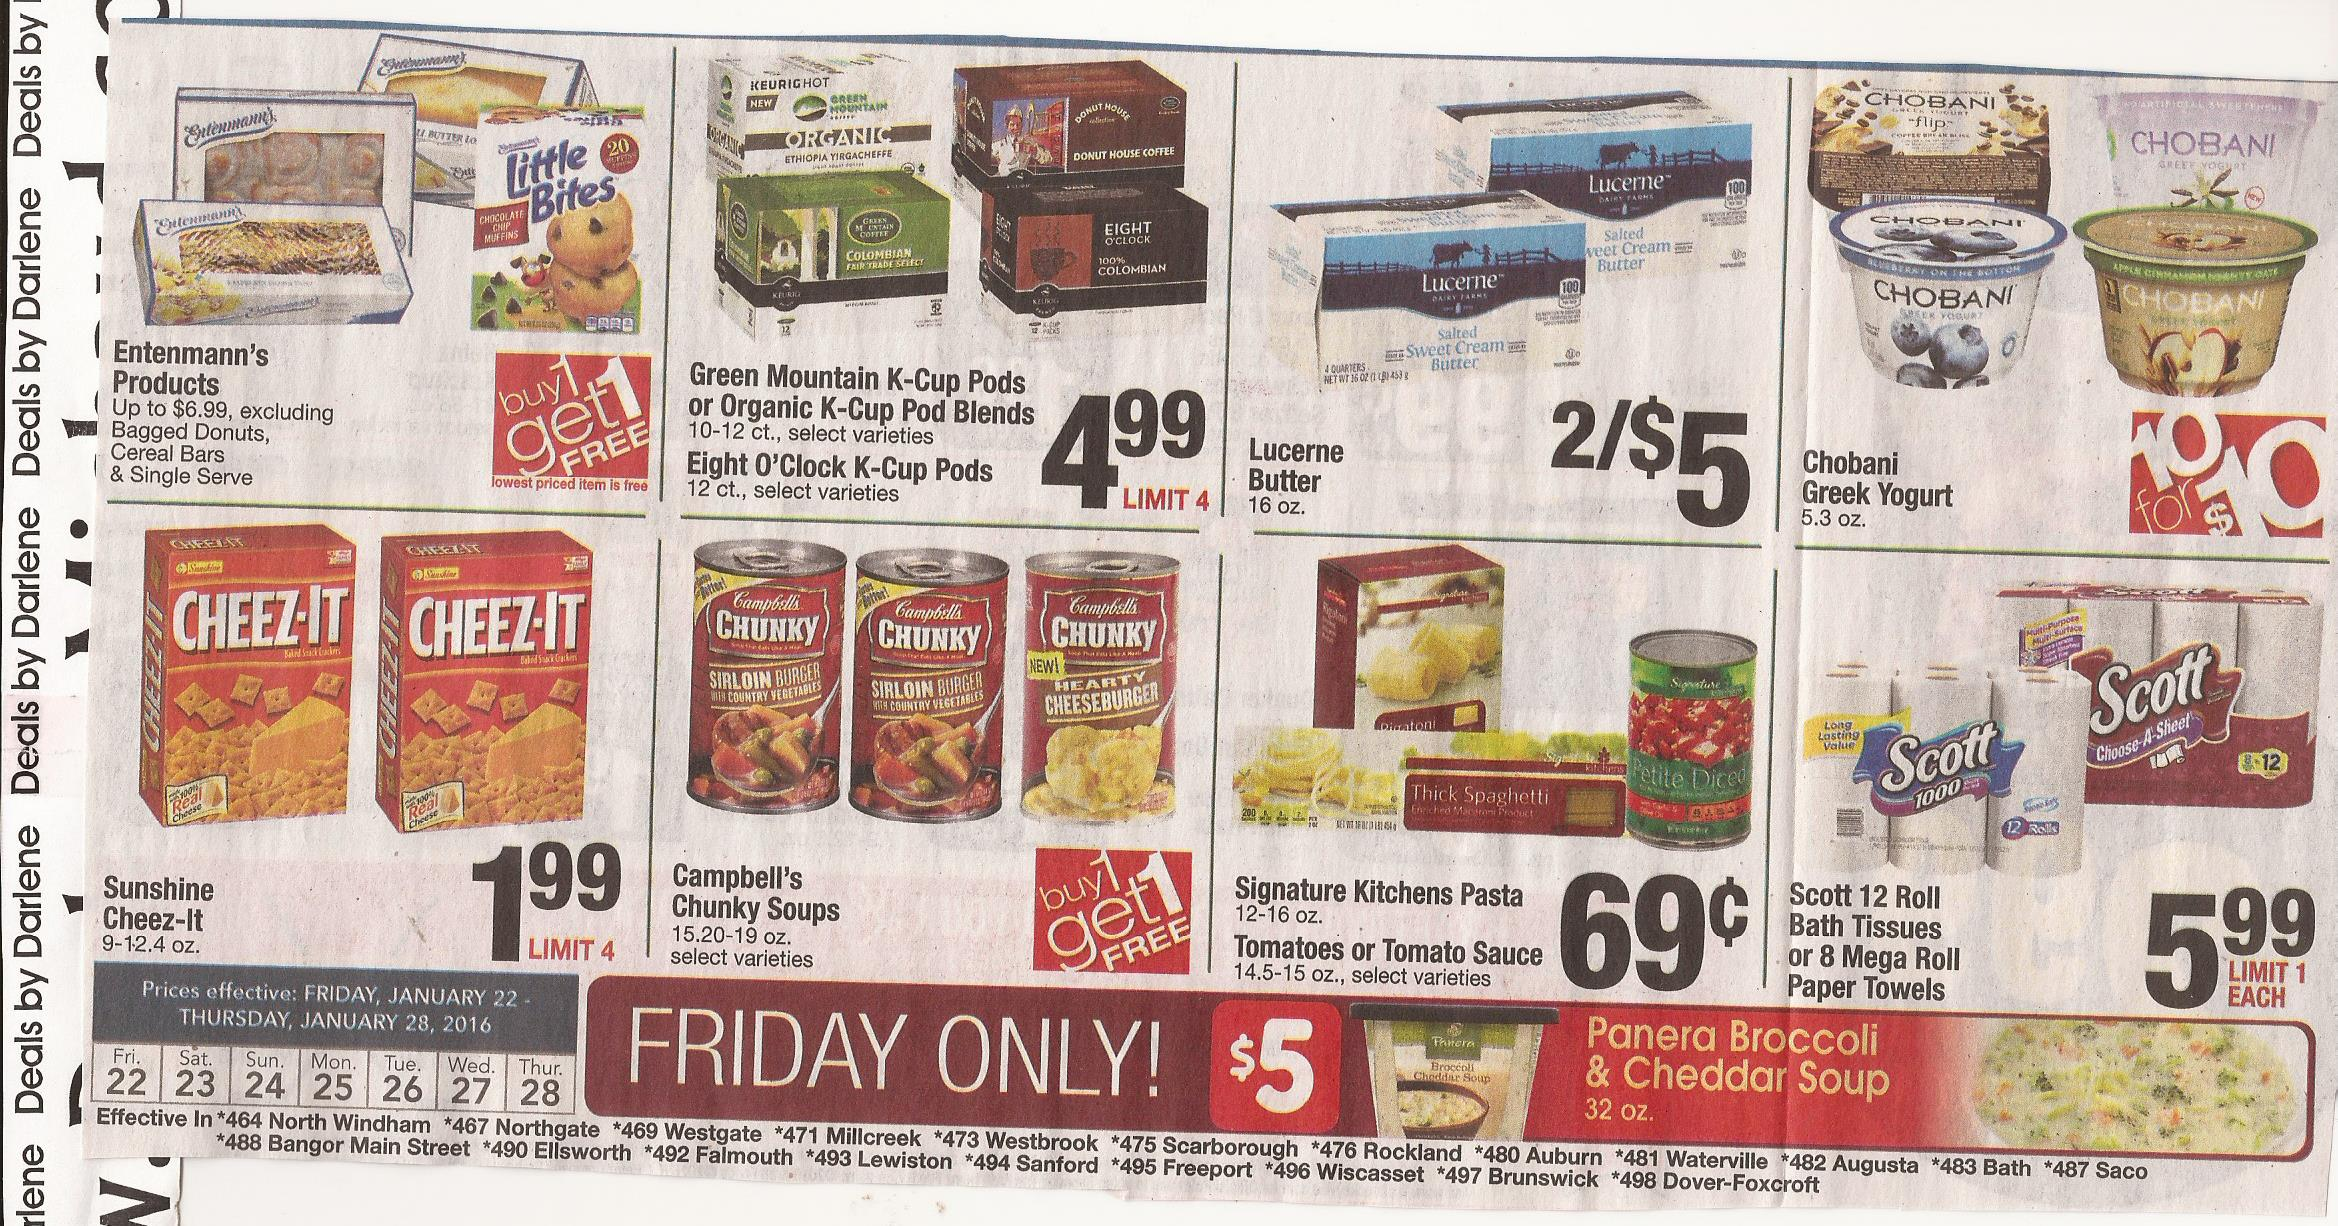 Recent Posts. BUY 5, GET $5 OFF DEALS: $ Palmolive, $ Prego Pasta Sauce, $ General Mills Cereal, $ Silk Milk + MORE; $ Colgate Premium Toothpaste (reg. $).